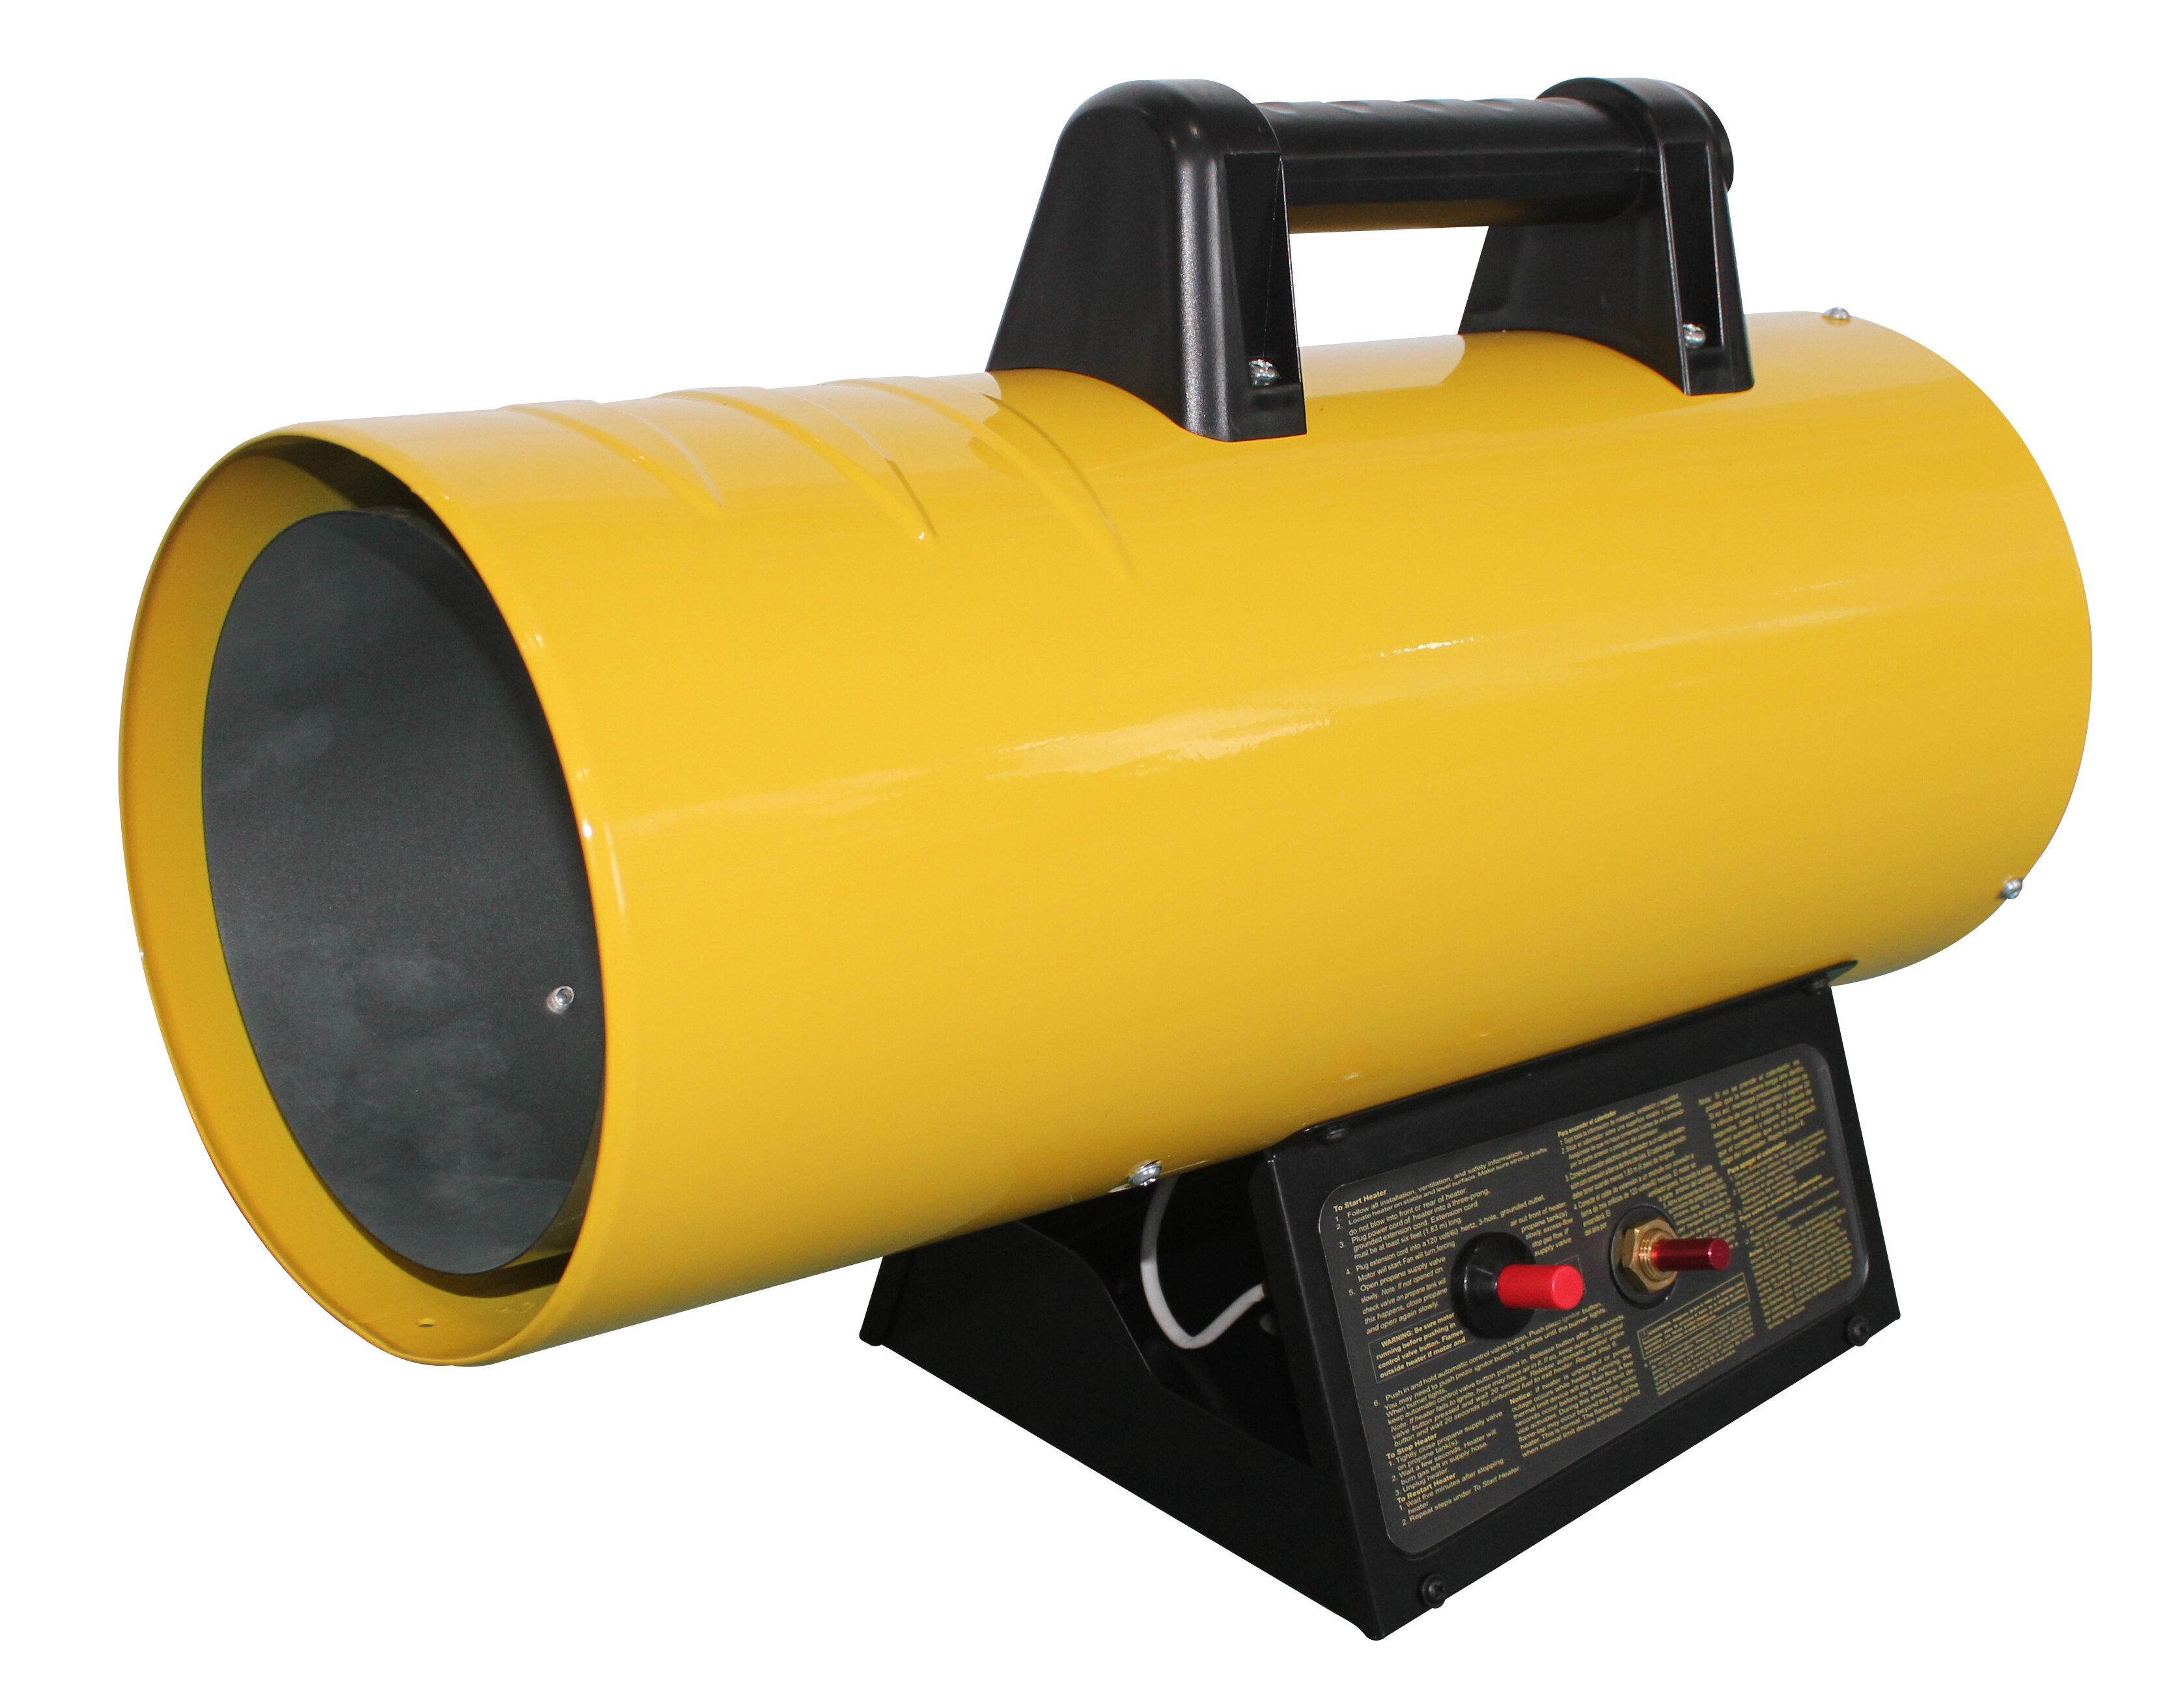 AZ Patio Heaters 40,000 BTU Propane Forced Air Utility Heater | Wayfair